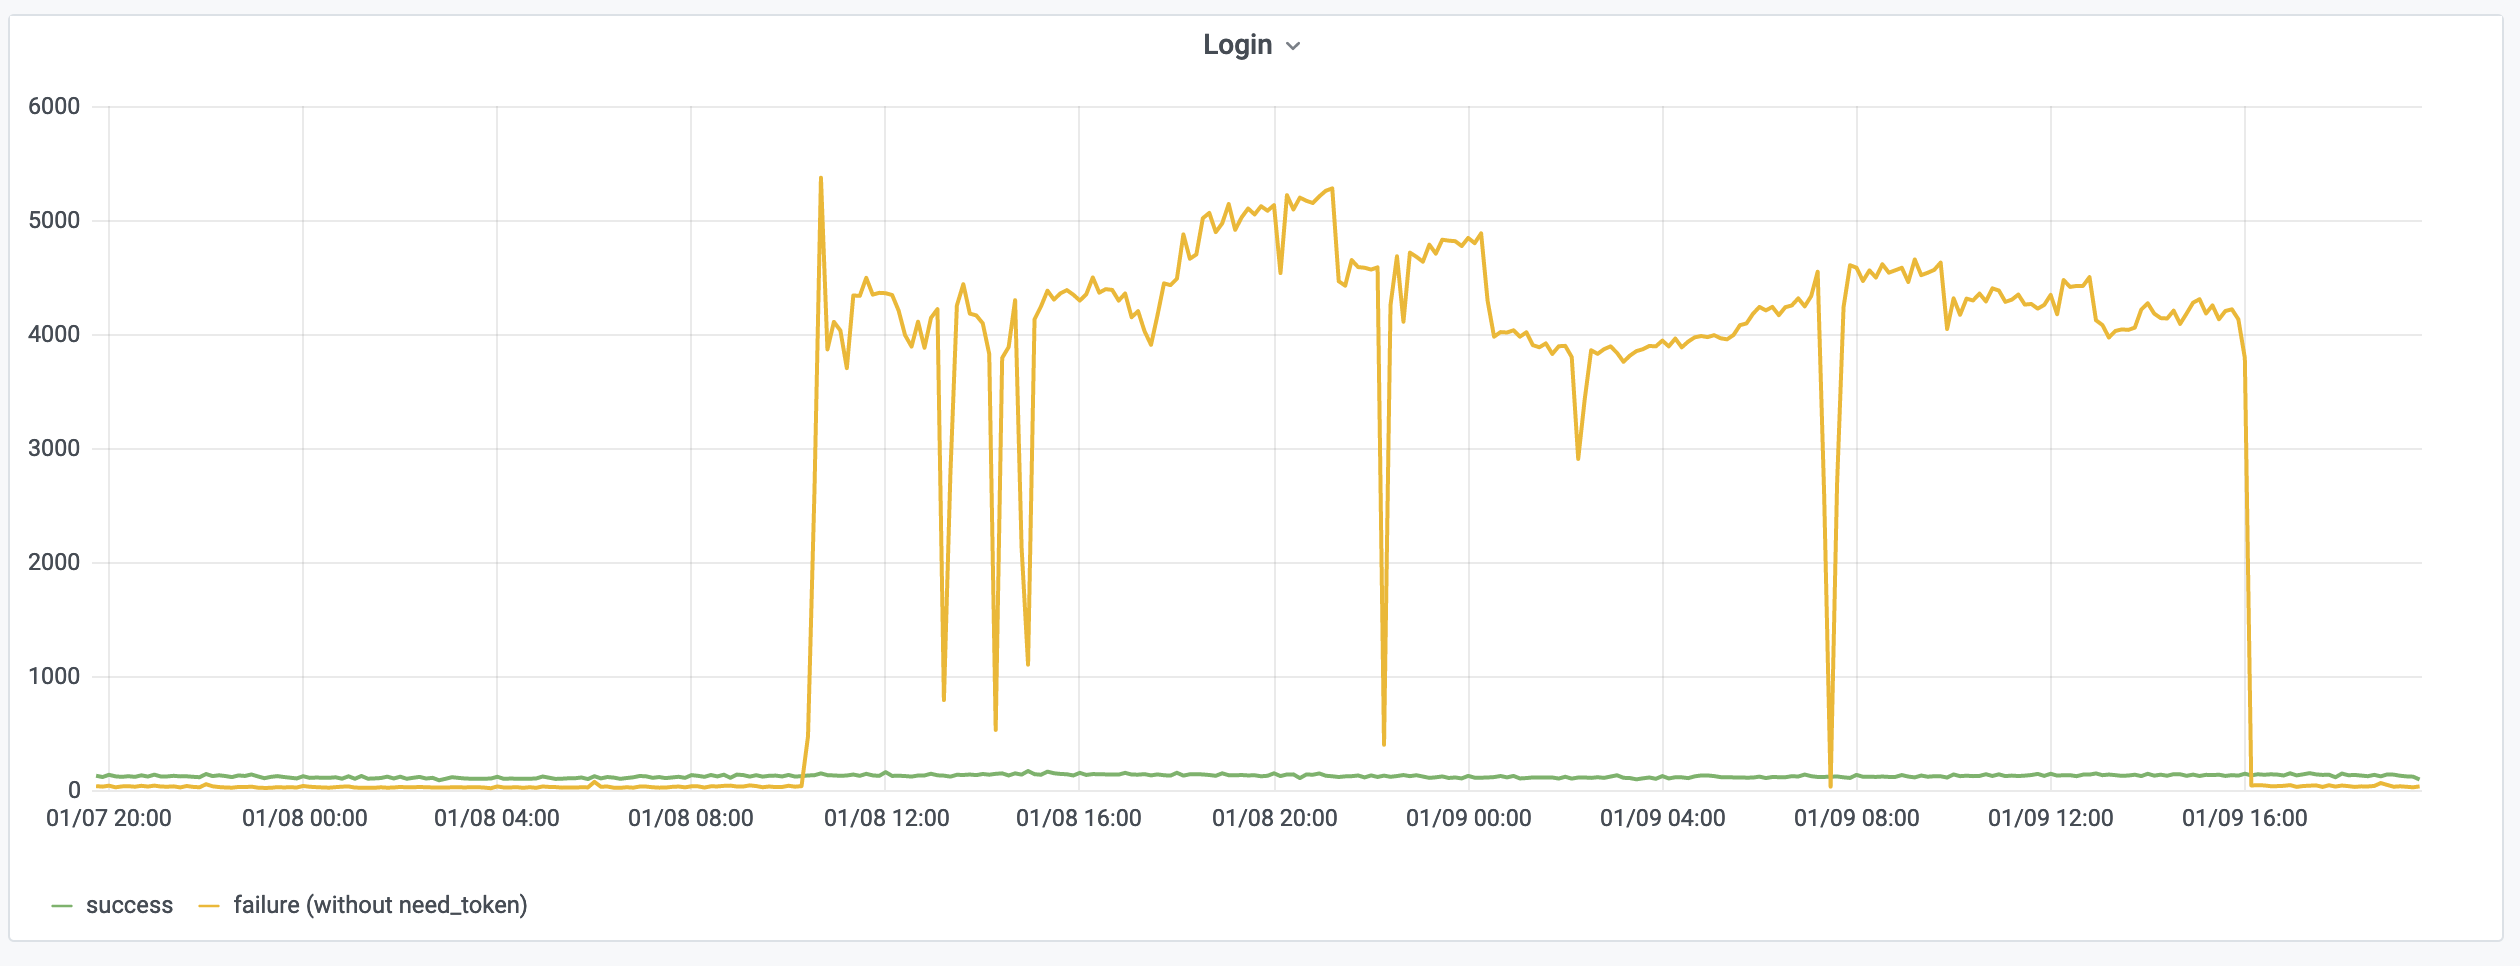 Screenshot 2021-01-09 at 19.39.21.png (966×2 px, 175 KB)